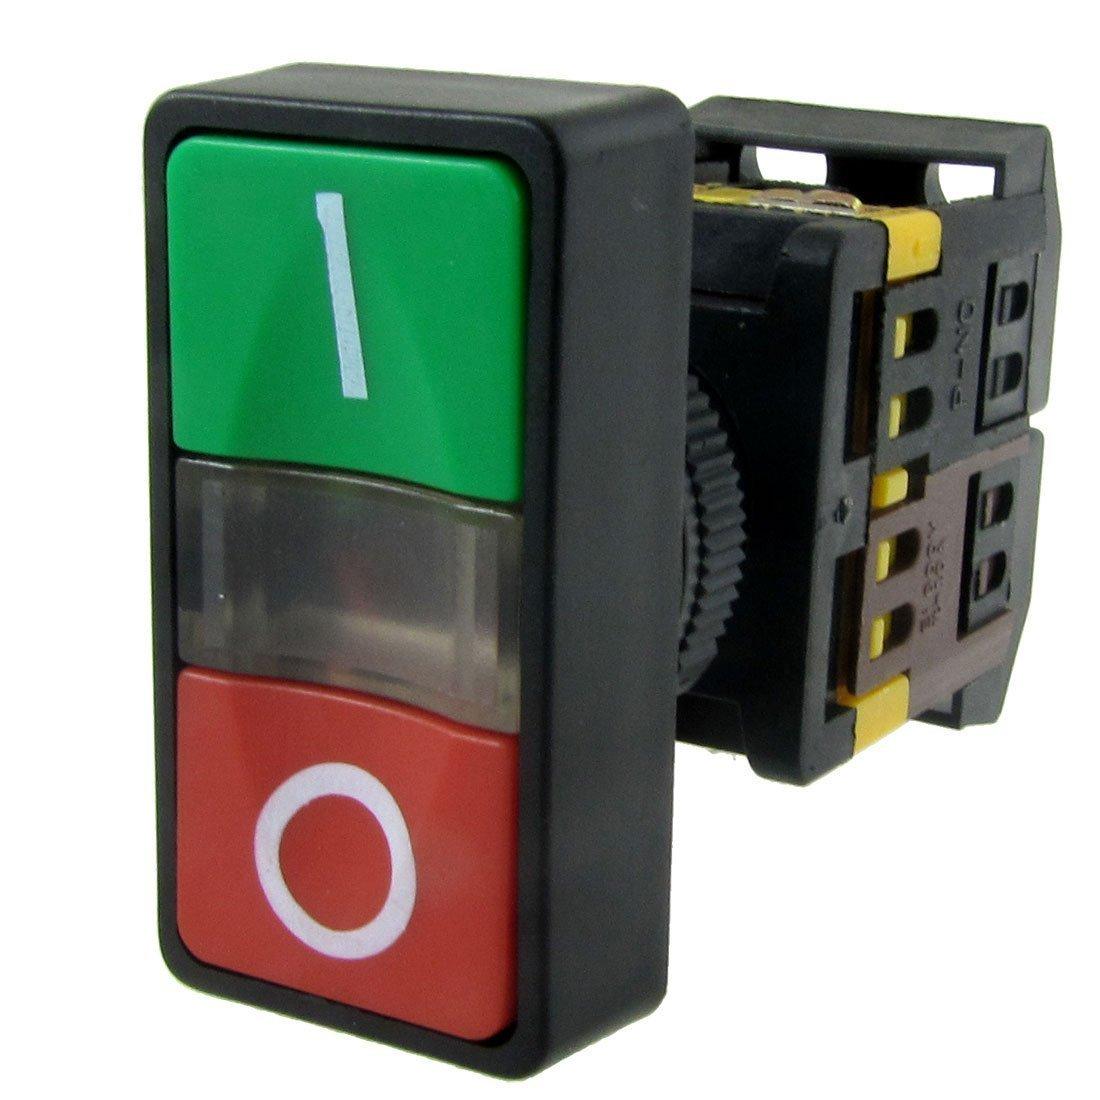 TOOGOO(R) AC 220V Luz amarilla ENCENDIDO APAGADO COMIENZO PARADA Interruptor de boton pulsador momentaneo 1 NO 1 NC SHOMAGT13452